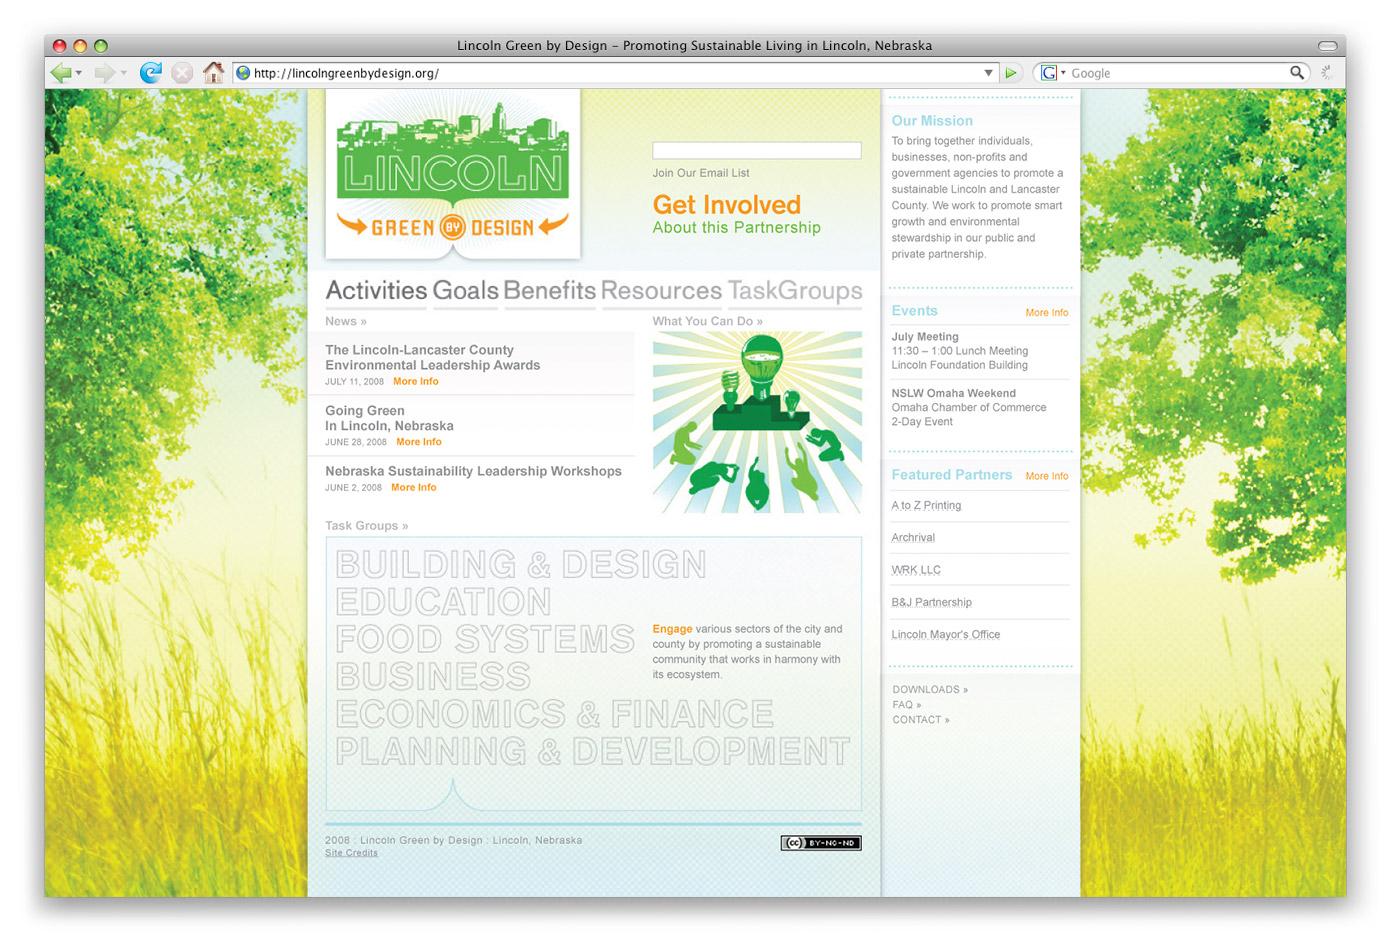 jkd_lgbd-sitelarge.jpg